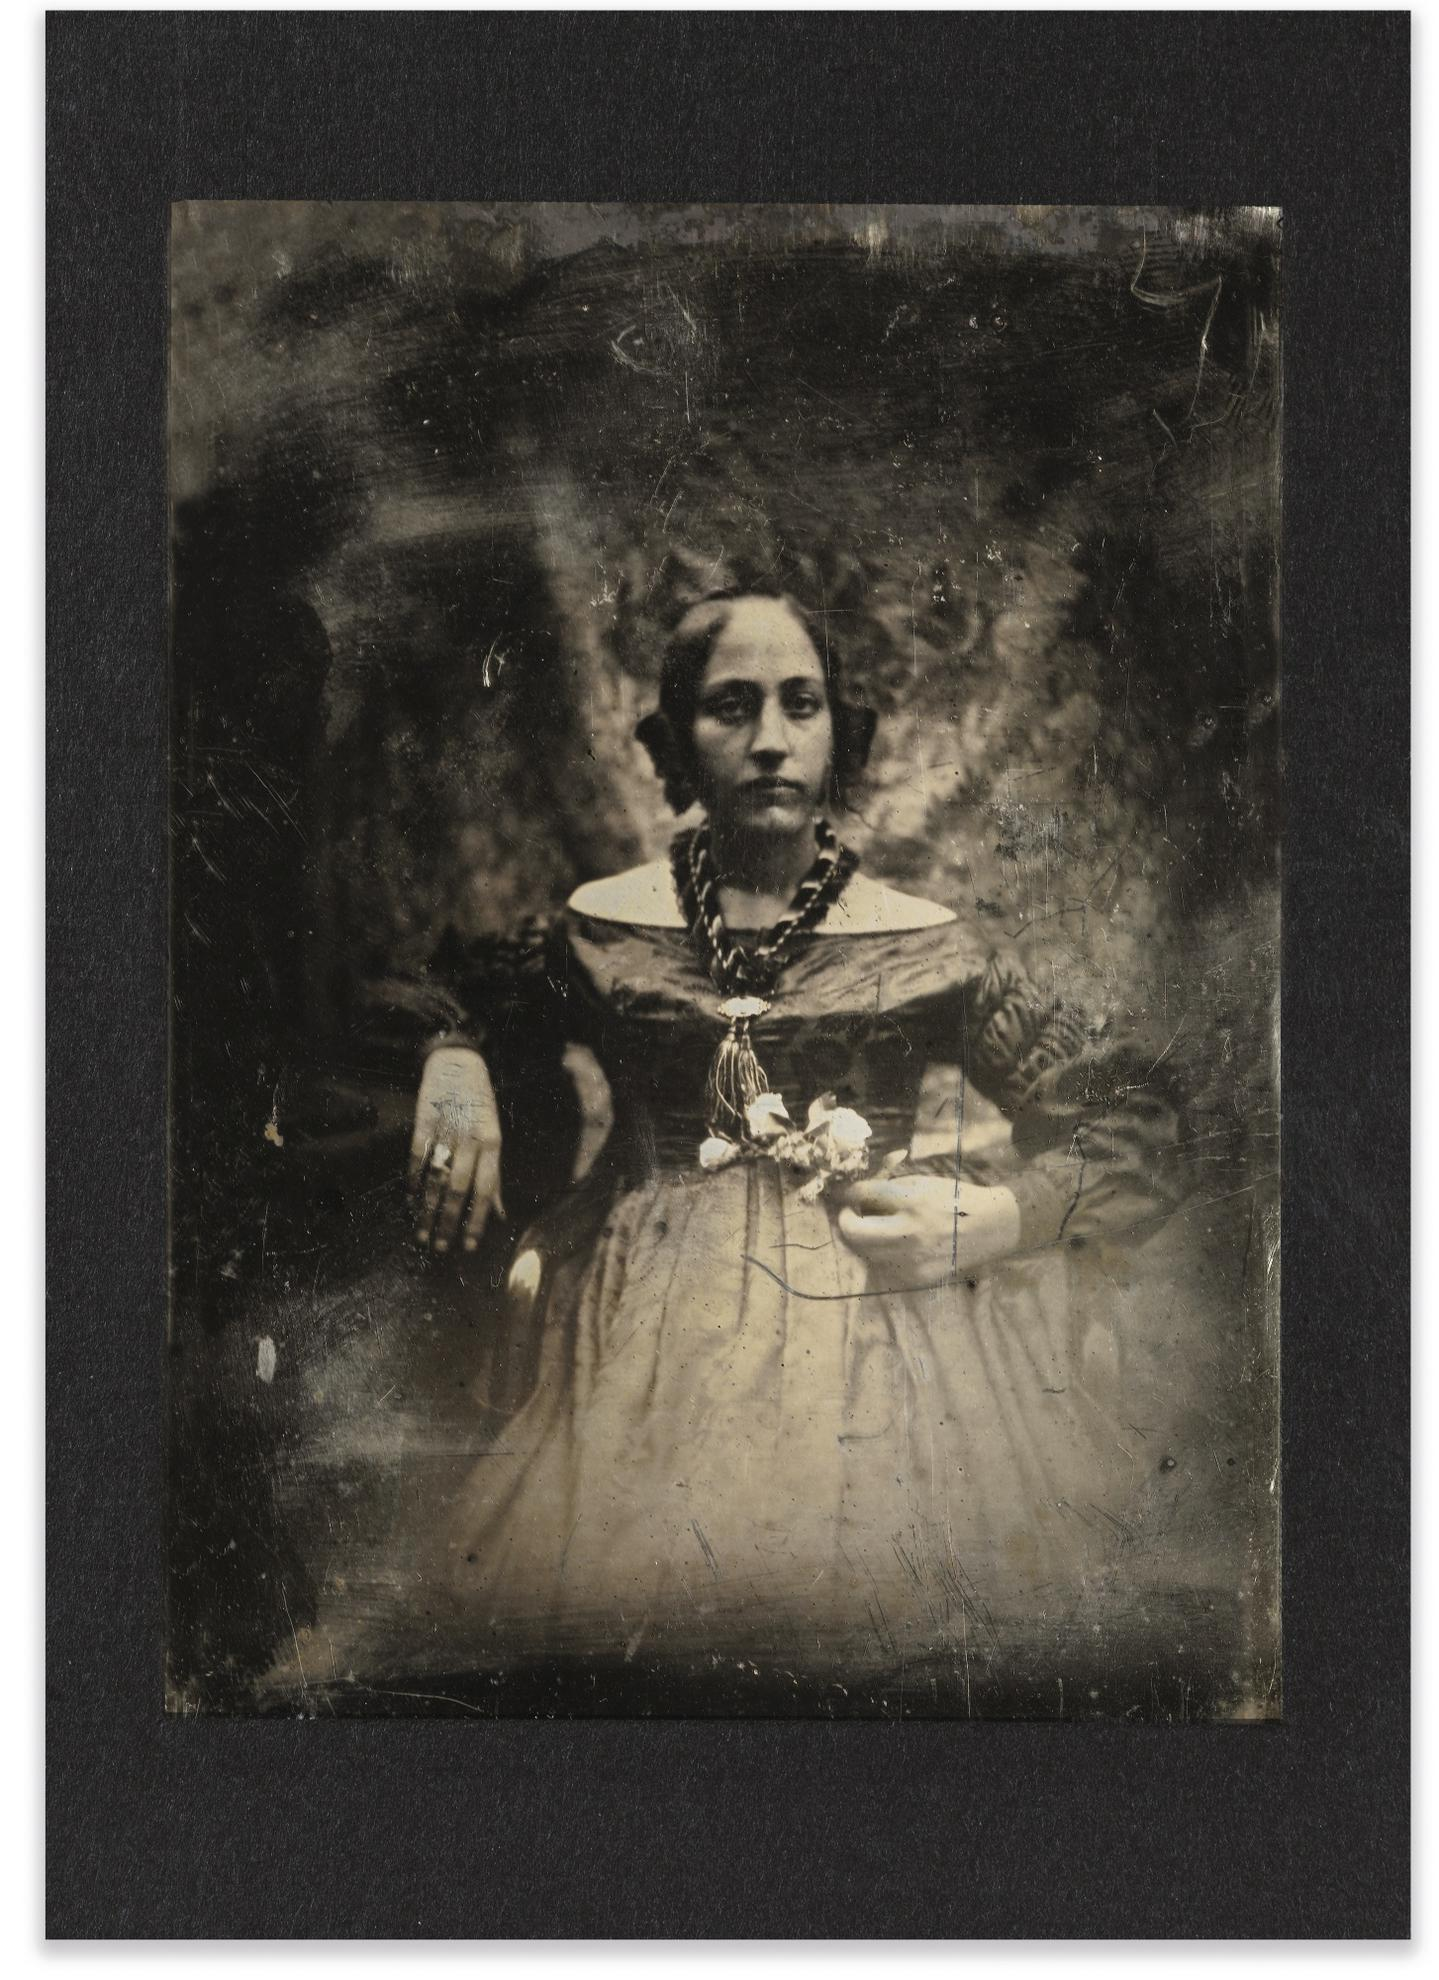 Joseph Philibert Girault De Prangey - Portrait Dune Jeune Femme, Fleur A La Main-1842